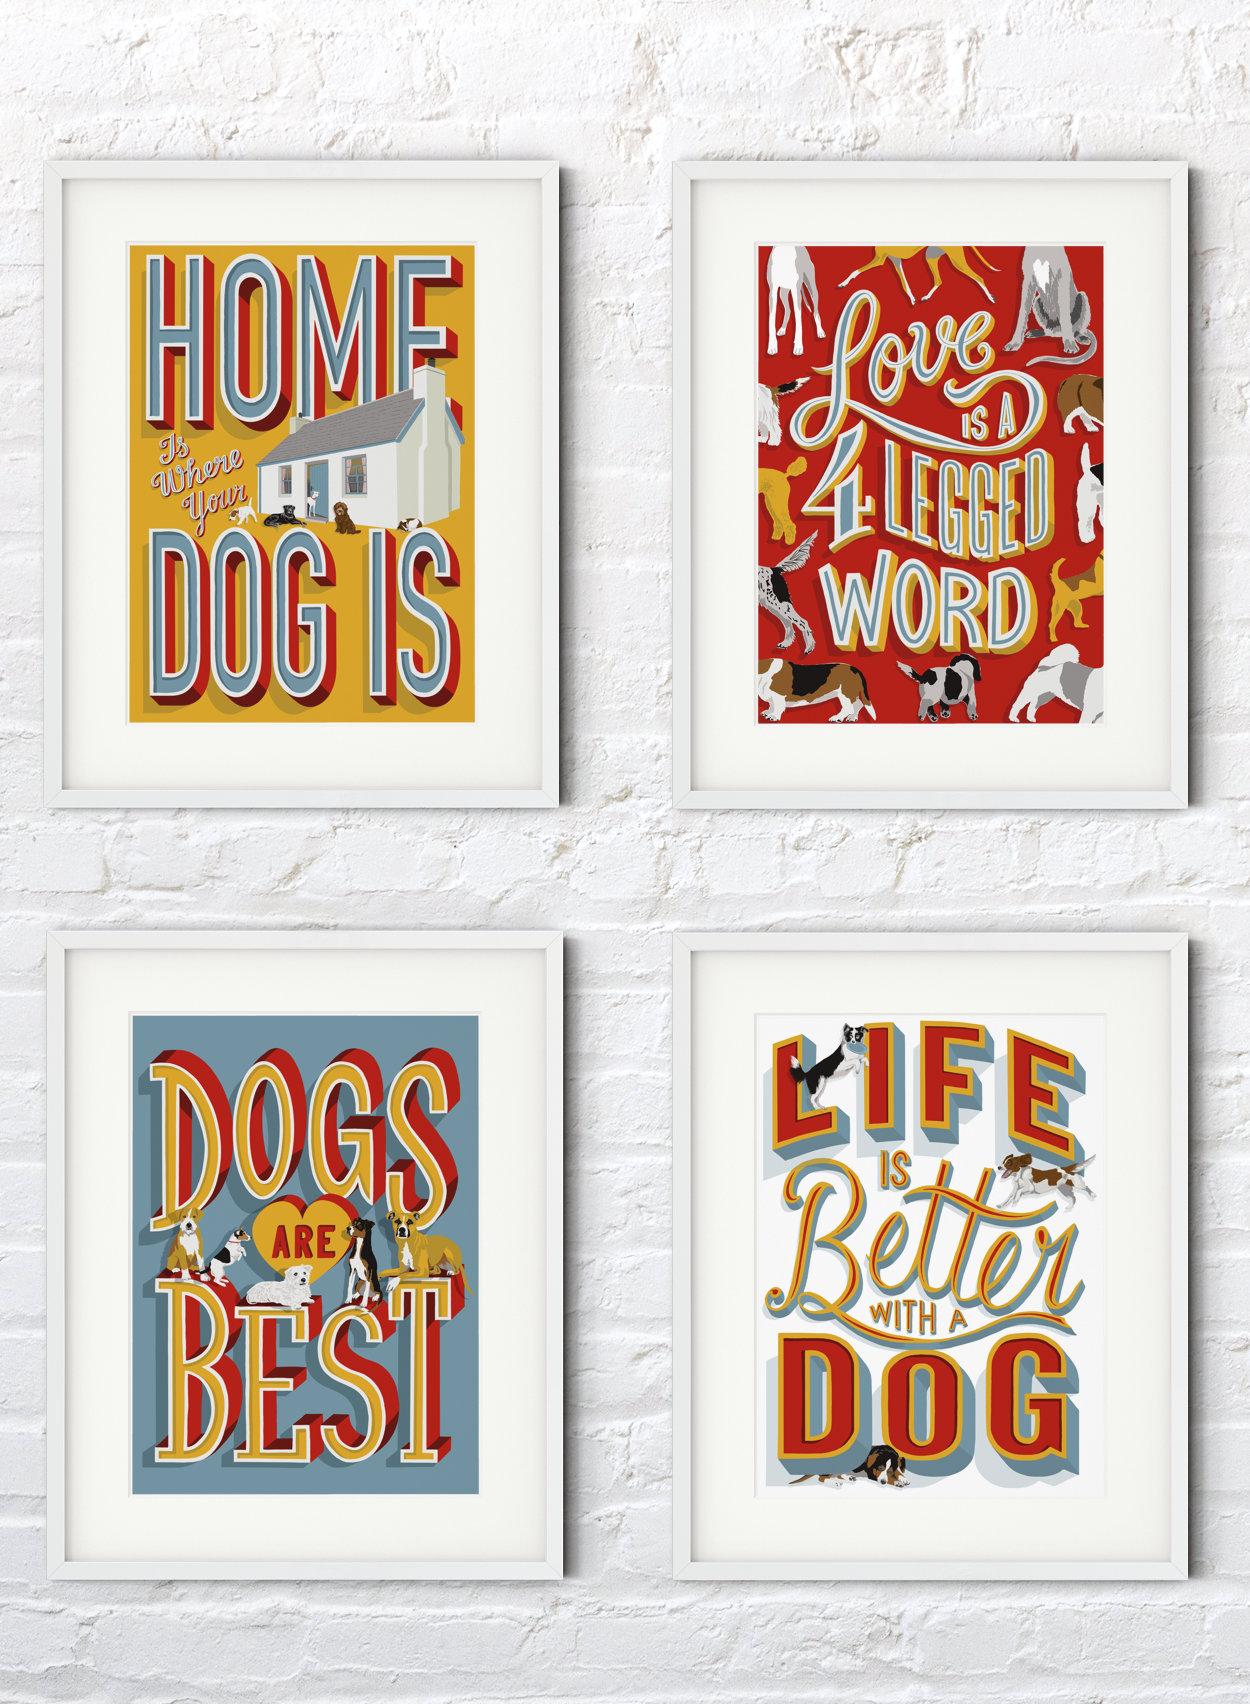 Dog Lover Framed Prints | The Enlightened Hound